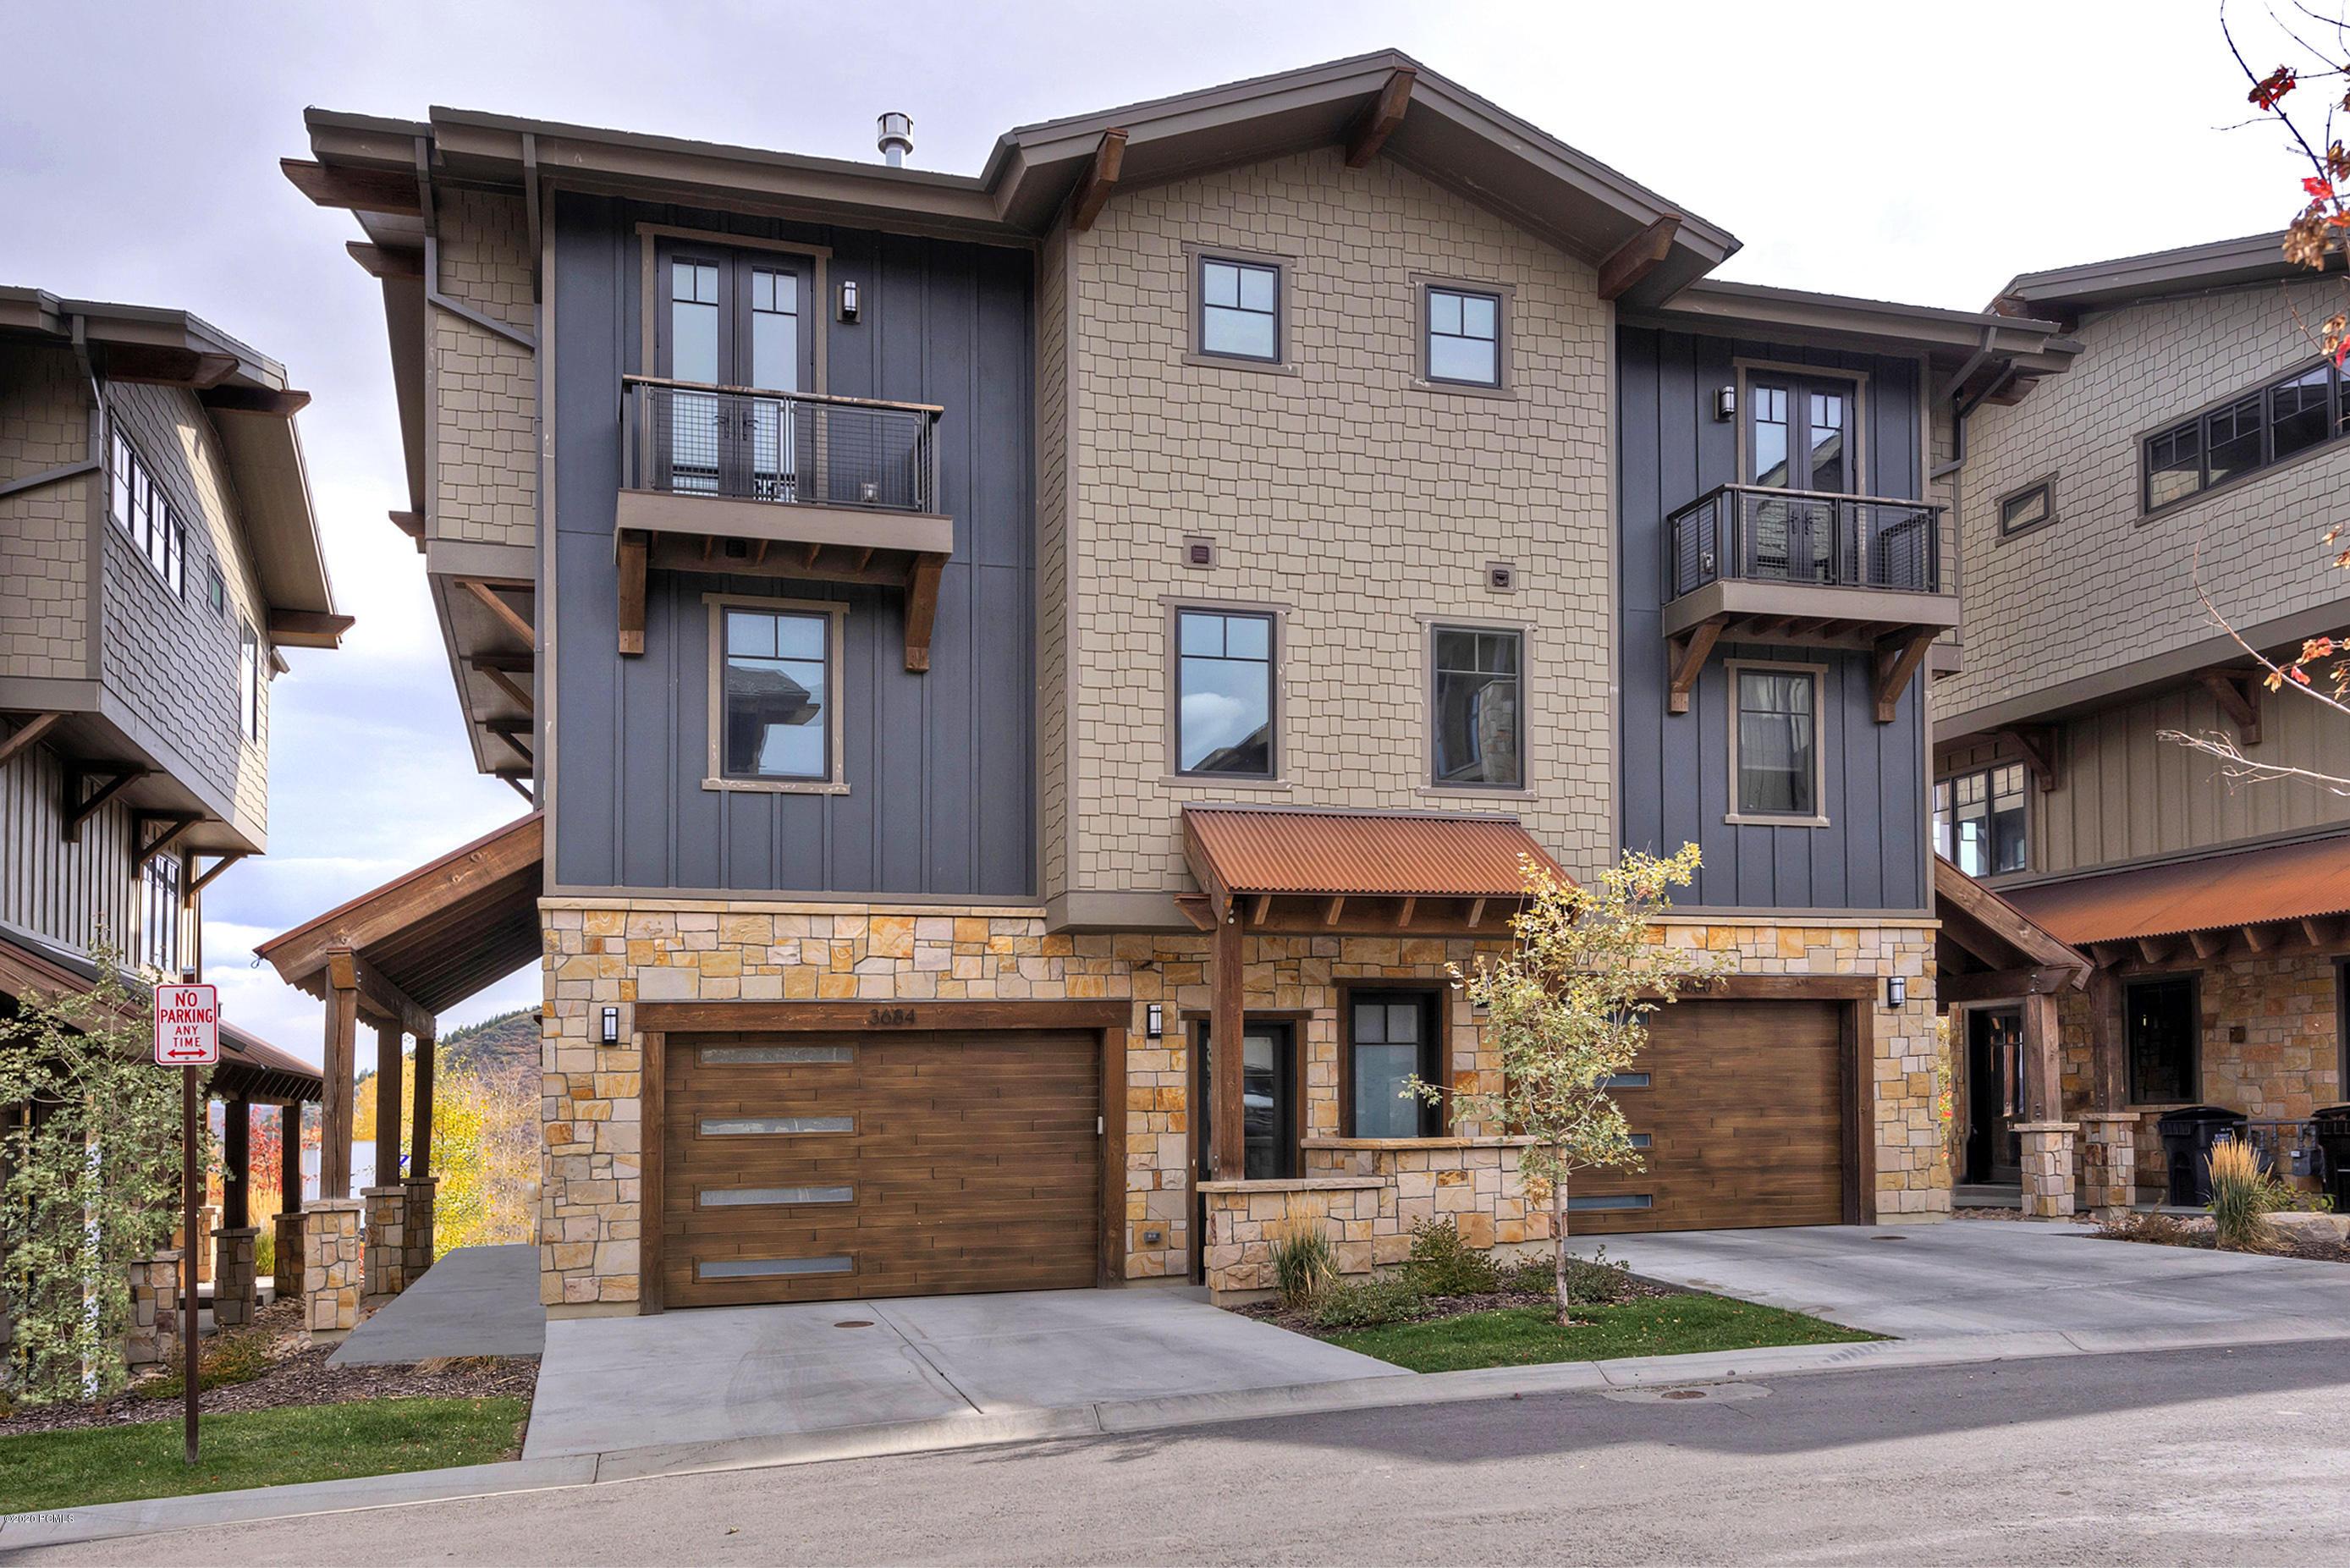 3684 Blackstone Drive, Park City, Utah 84098, 3 Bedrooms Bedrooms, ,3 BathroomsBathrooms,Condominium,For Sale,Blackstone,12003680